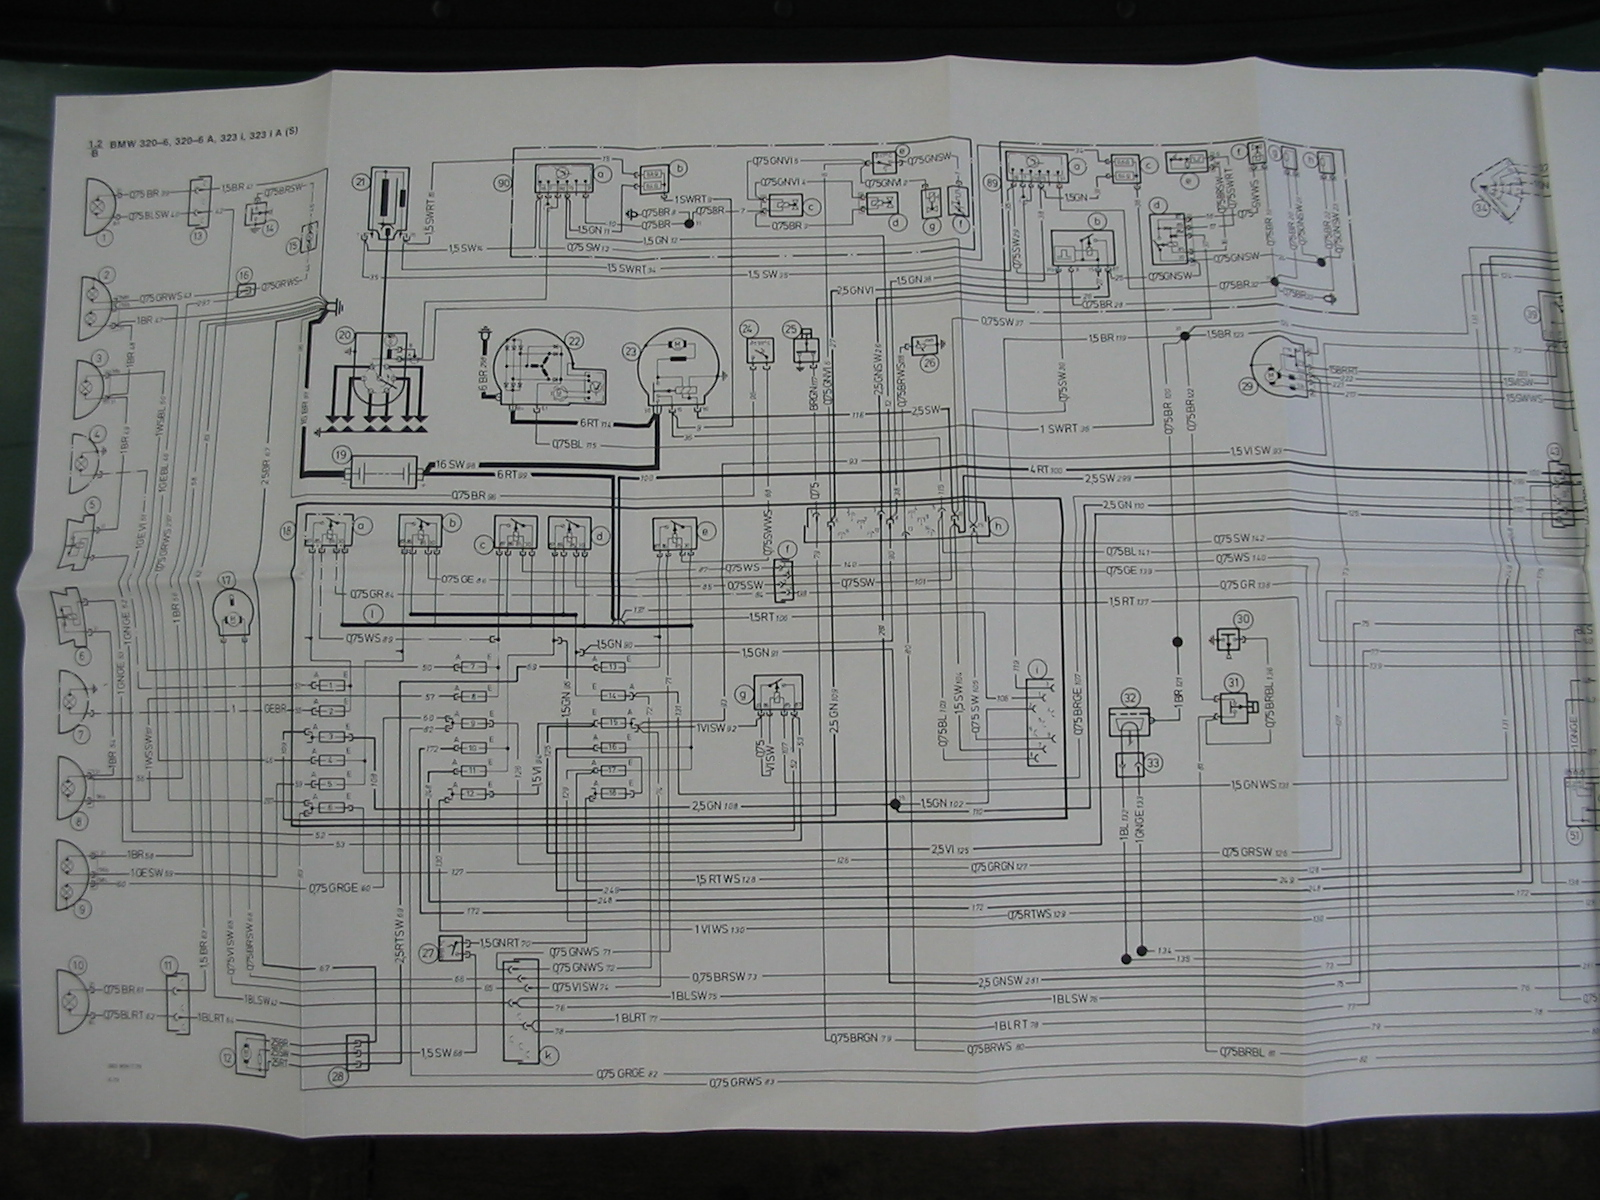 foren system von bmw 3er club e21 e30 e v und bmw baur. Black Bedroom Furniture Sets. Home Design Ideas